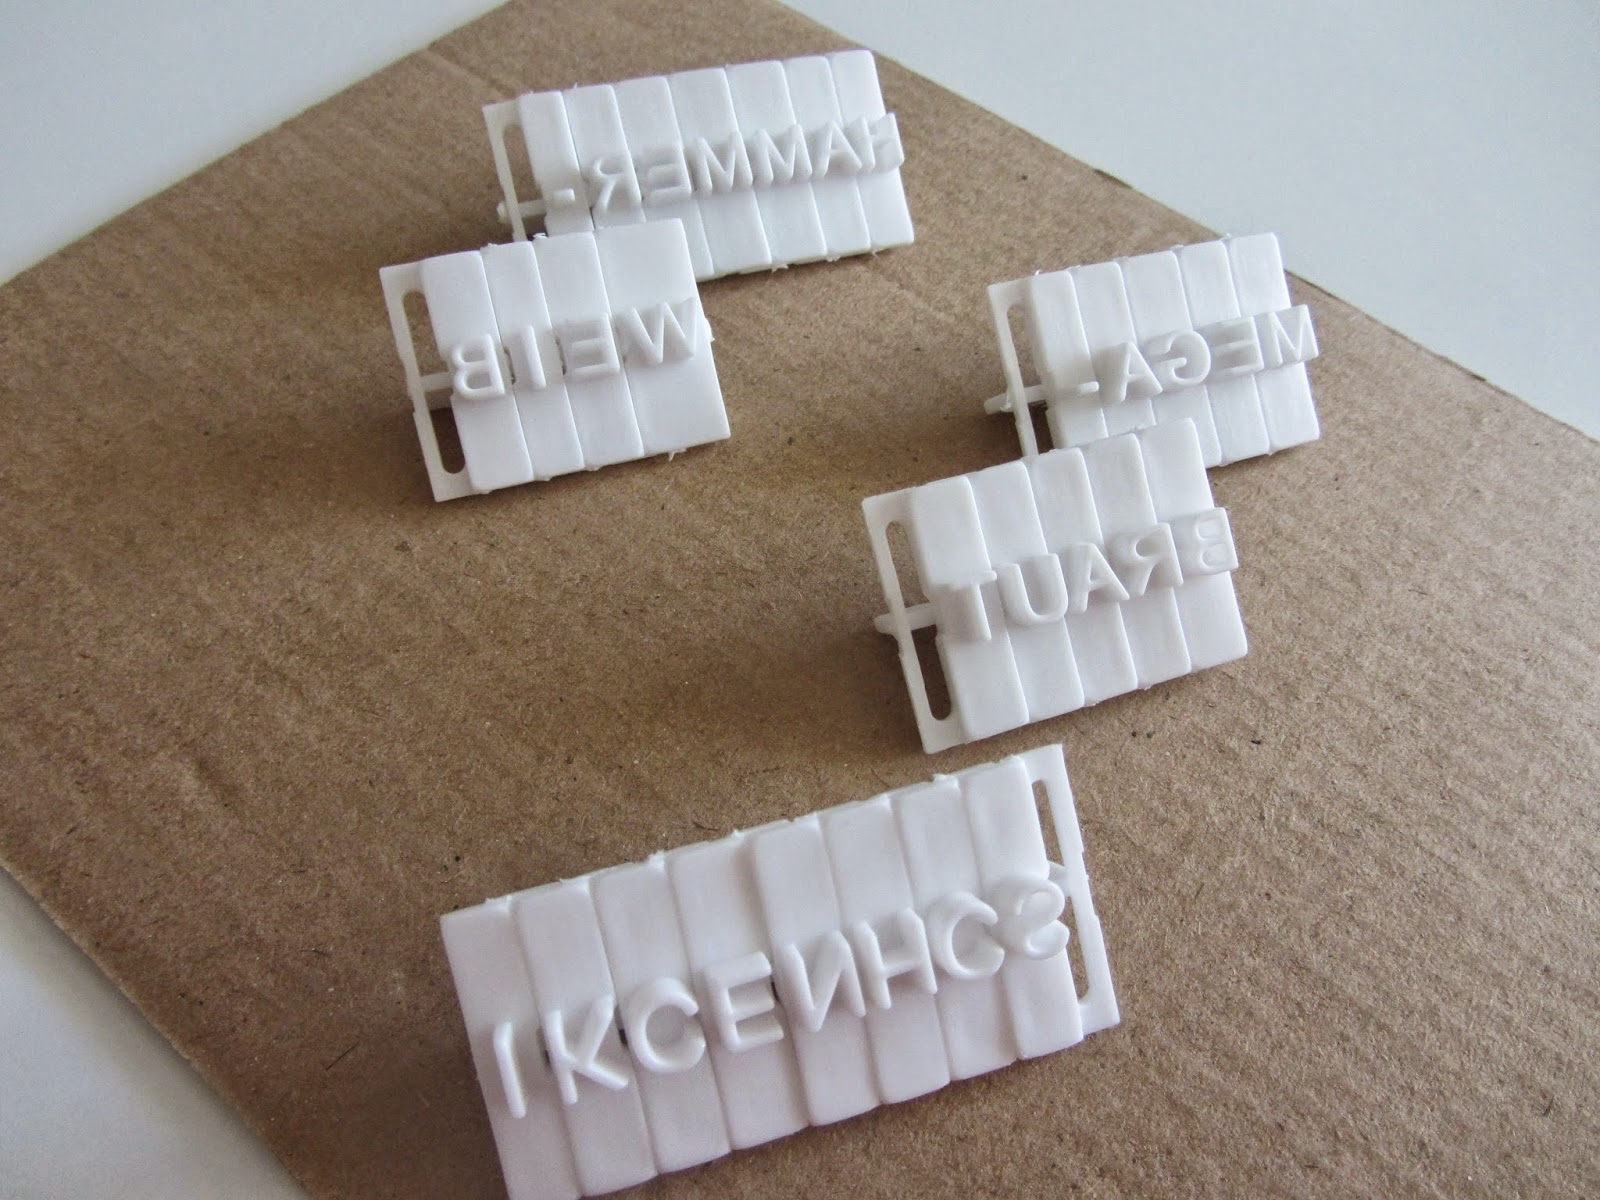 Keksstempel, Backen. Kreativblog, Häkelblog, Liebenswelt, DIY Blog